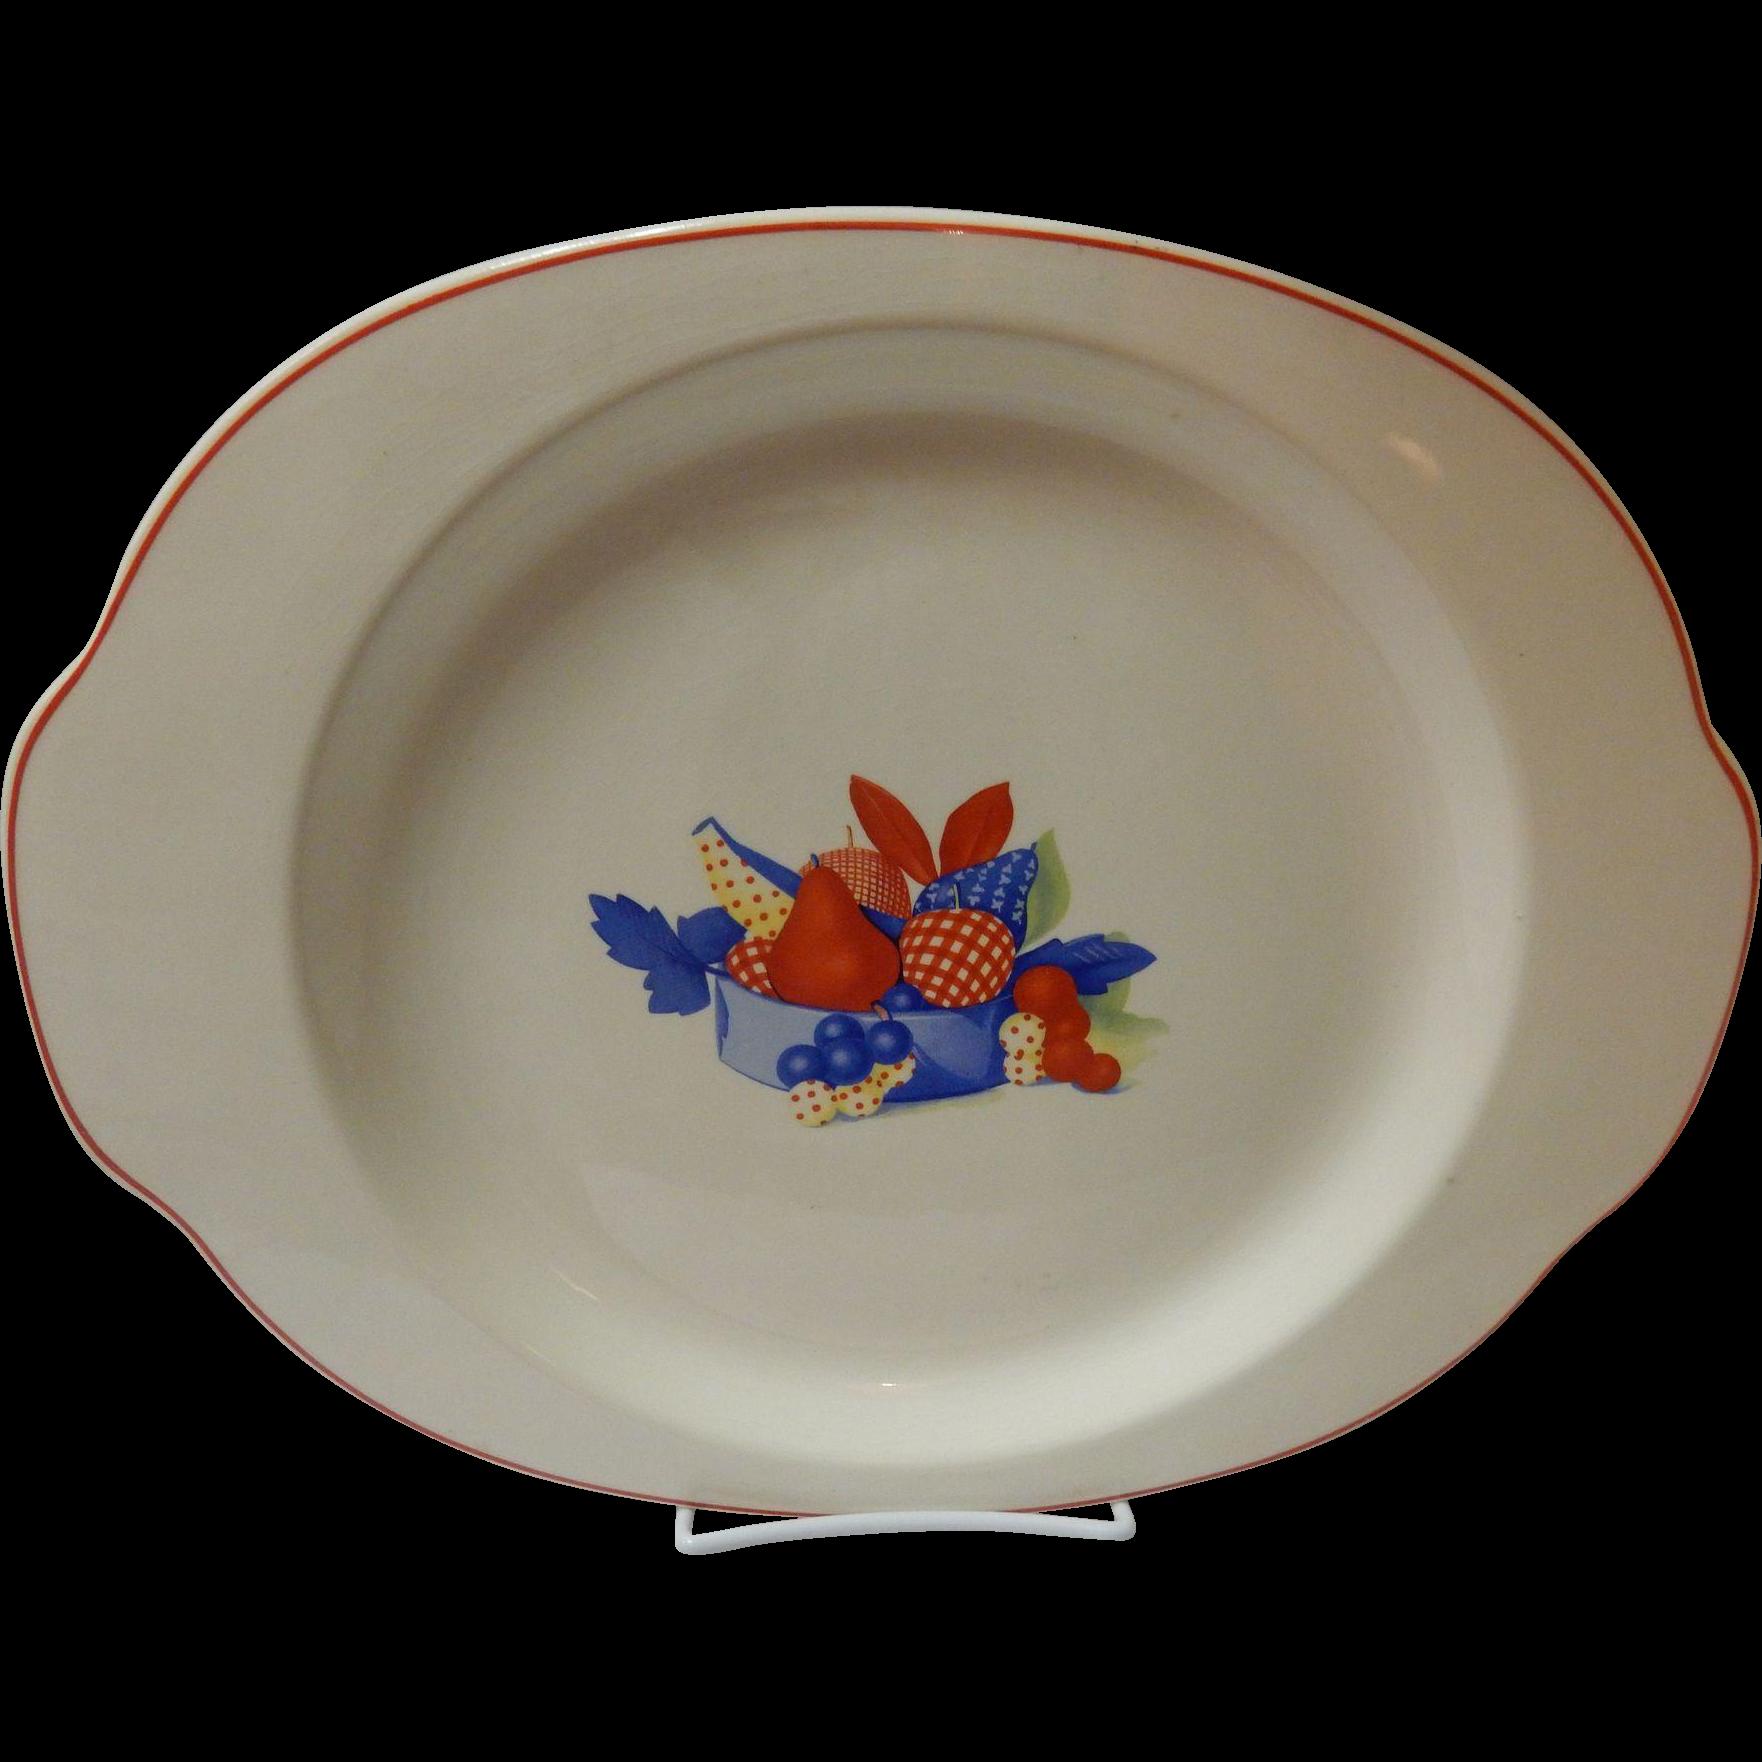 "Calico Fruit OVAL 13.5"" Platter Universal Cambridge Pottery"